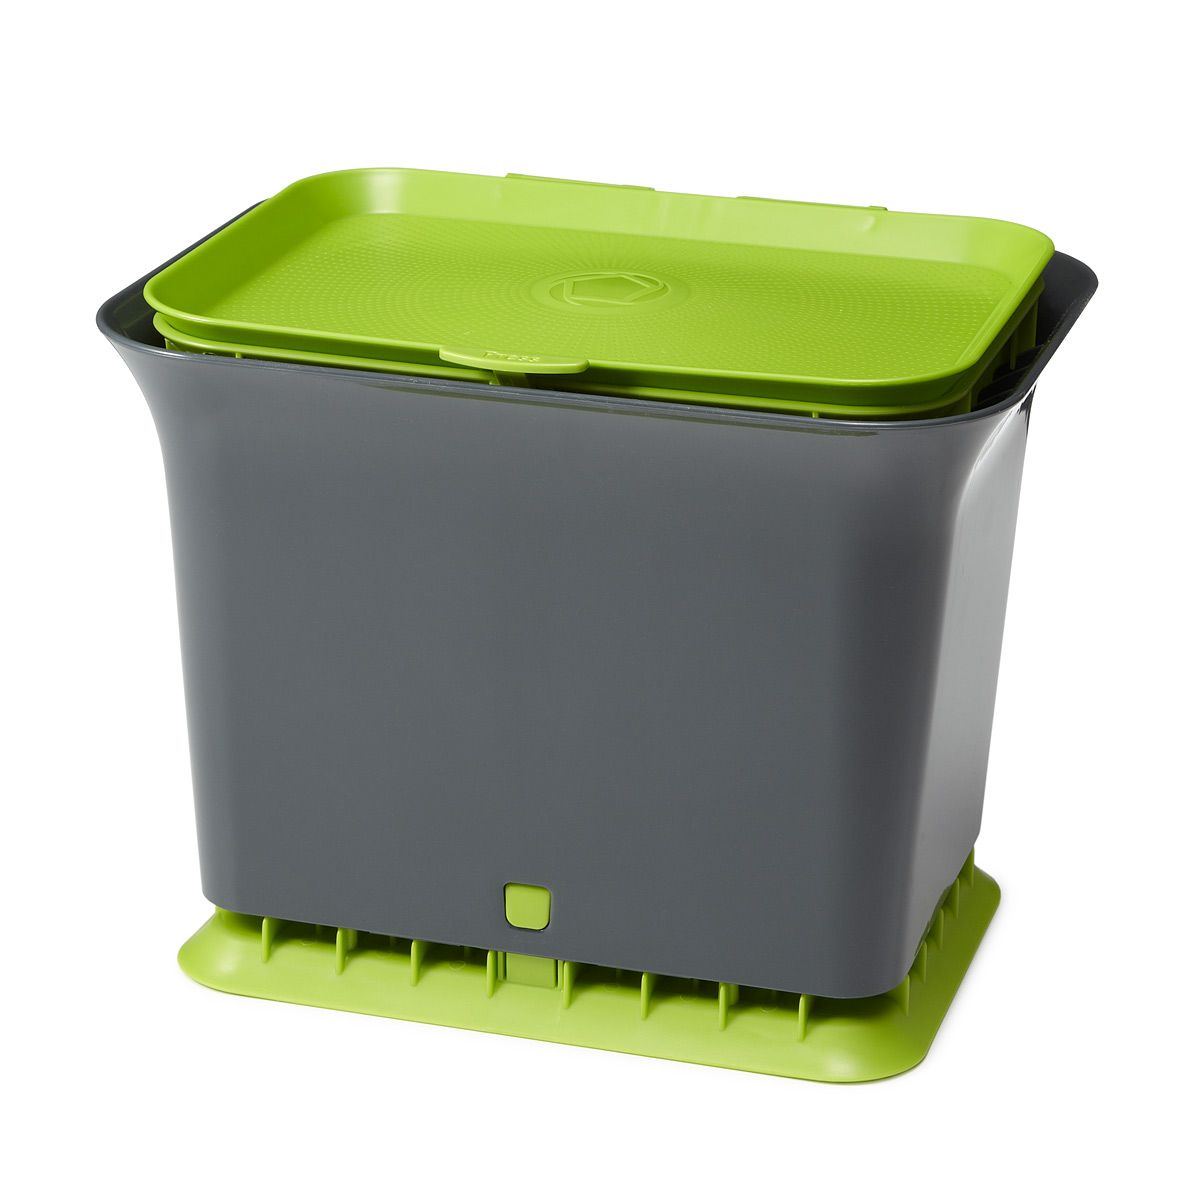 Fresh Air Compost Collector Composterscompost Containeruncommon Goodfun Kitchen